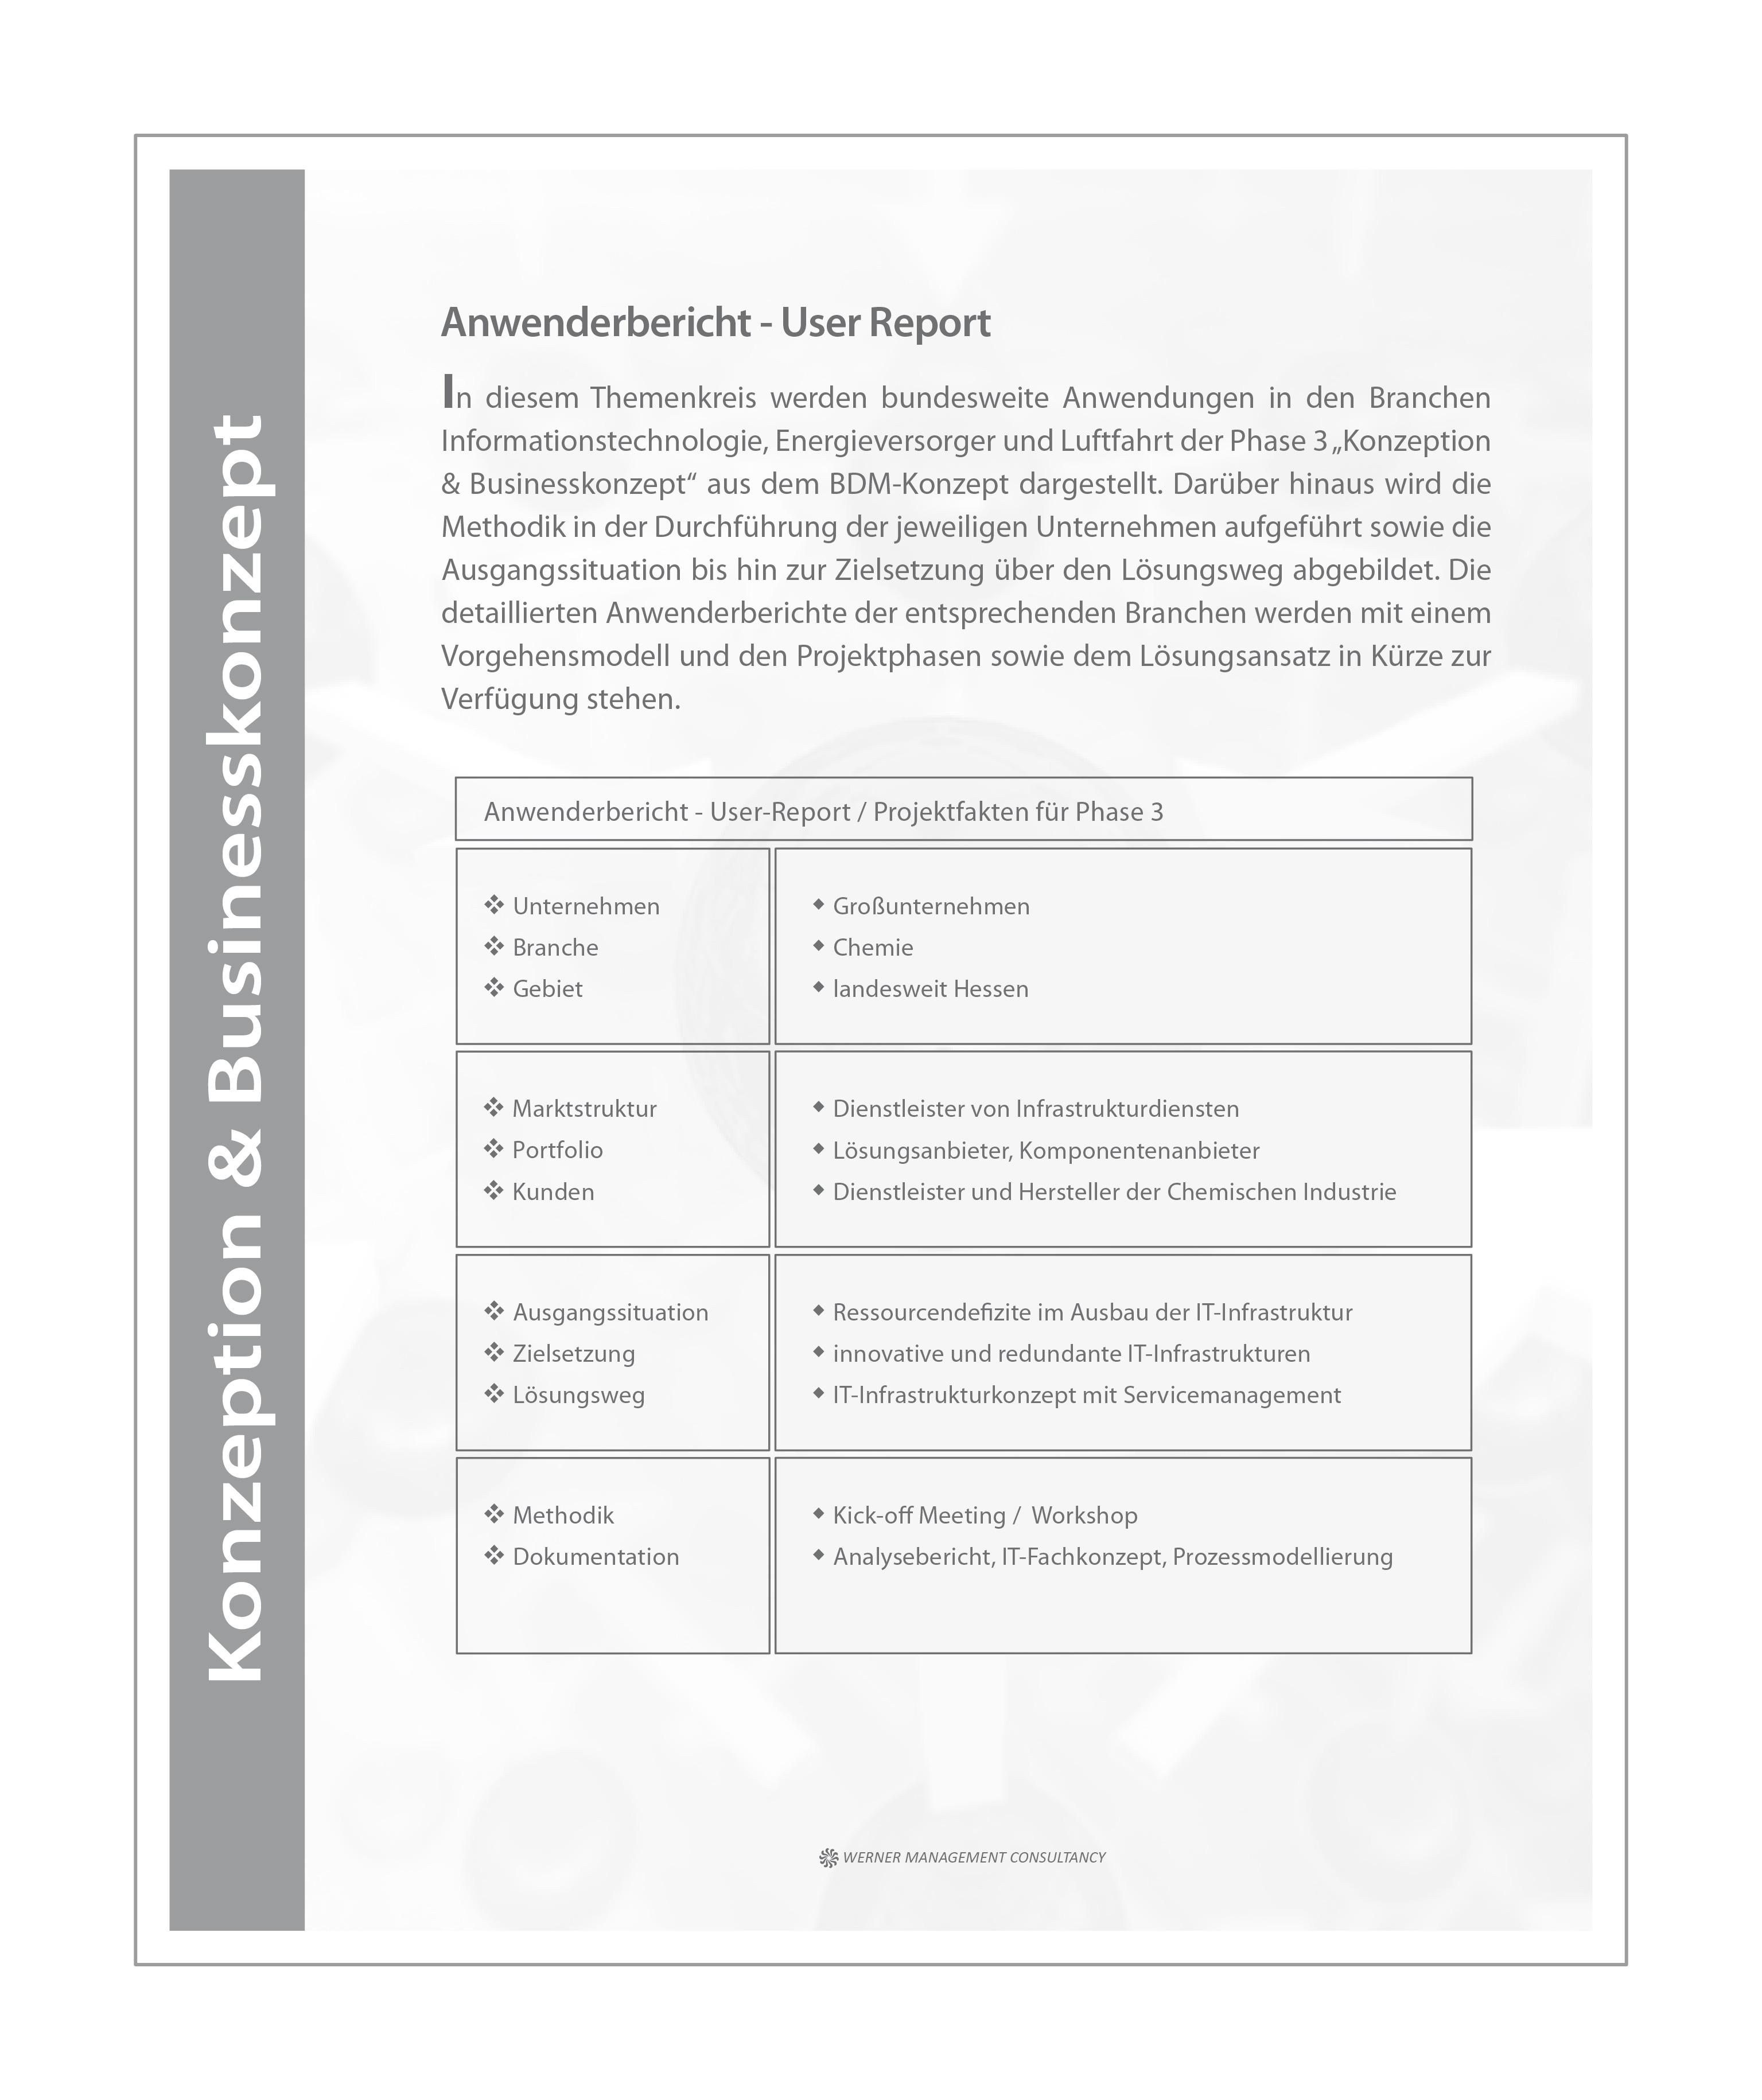 WMC Broschüre Business Development Phase-3 Anwenderbericht